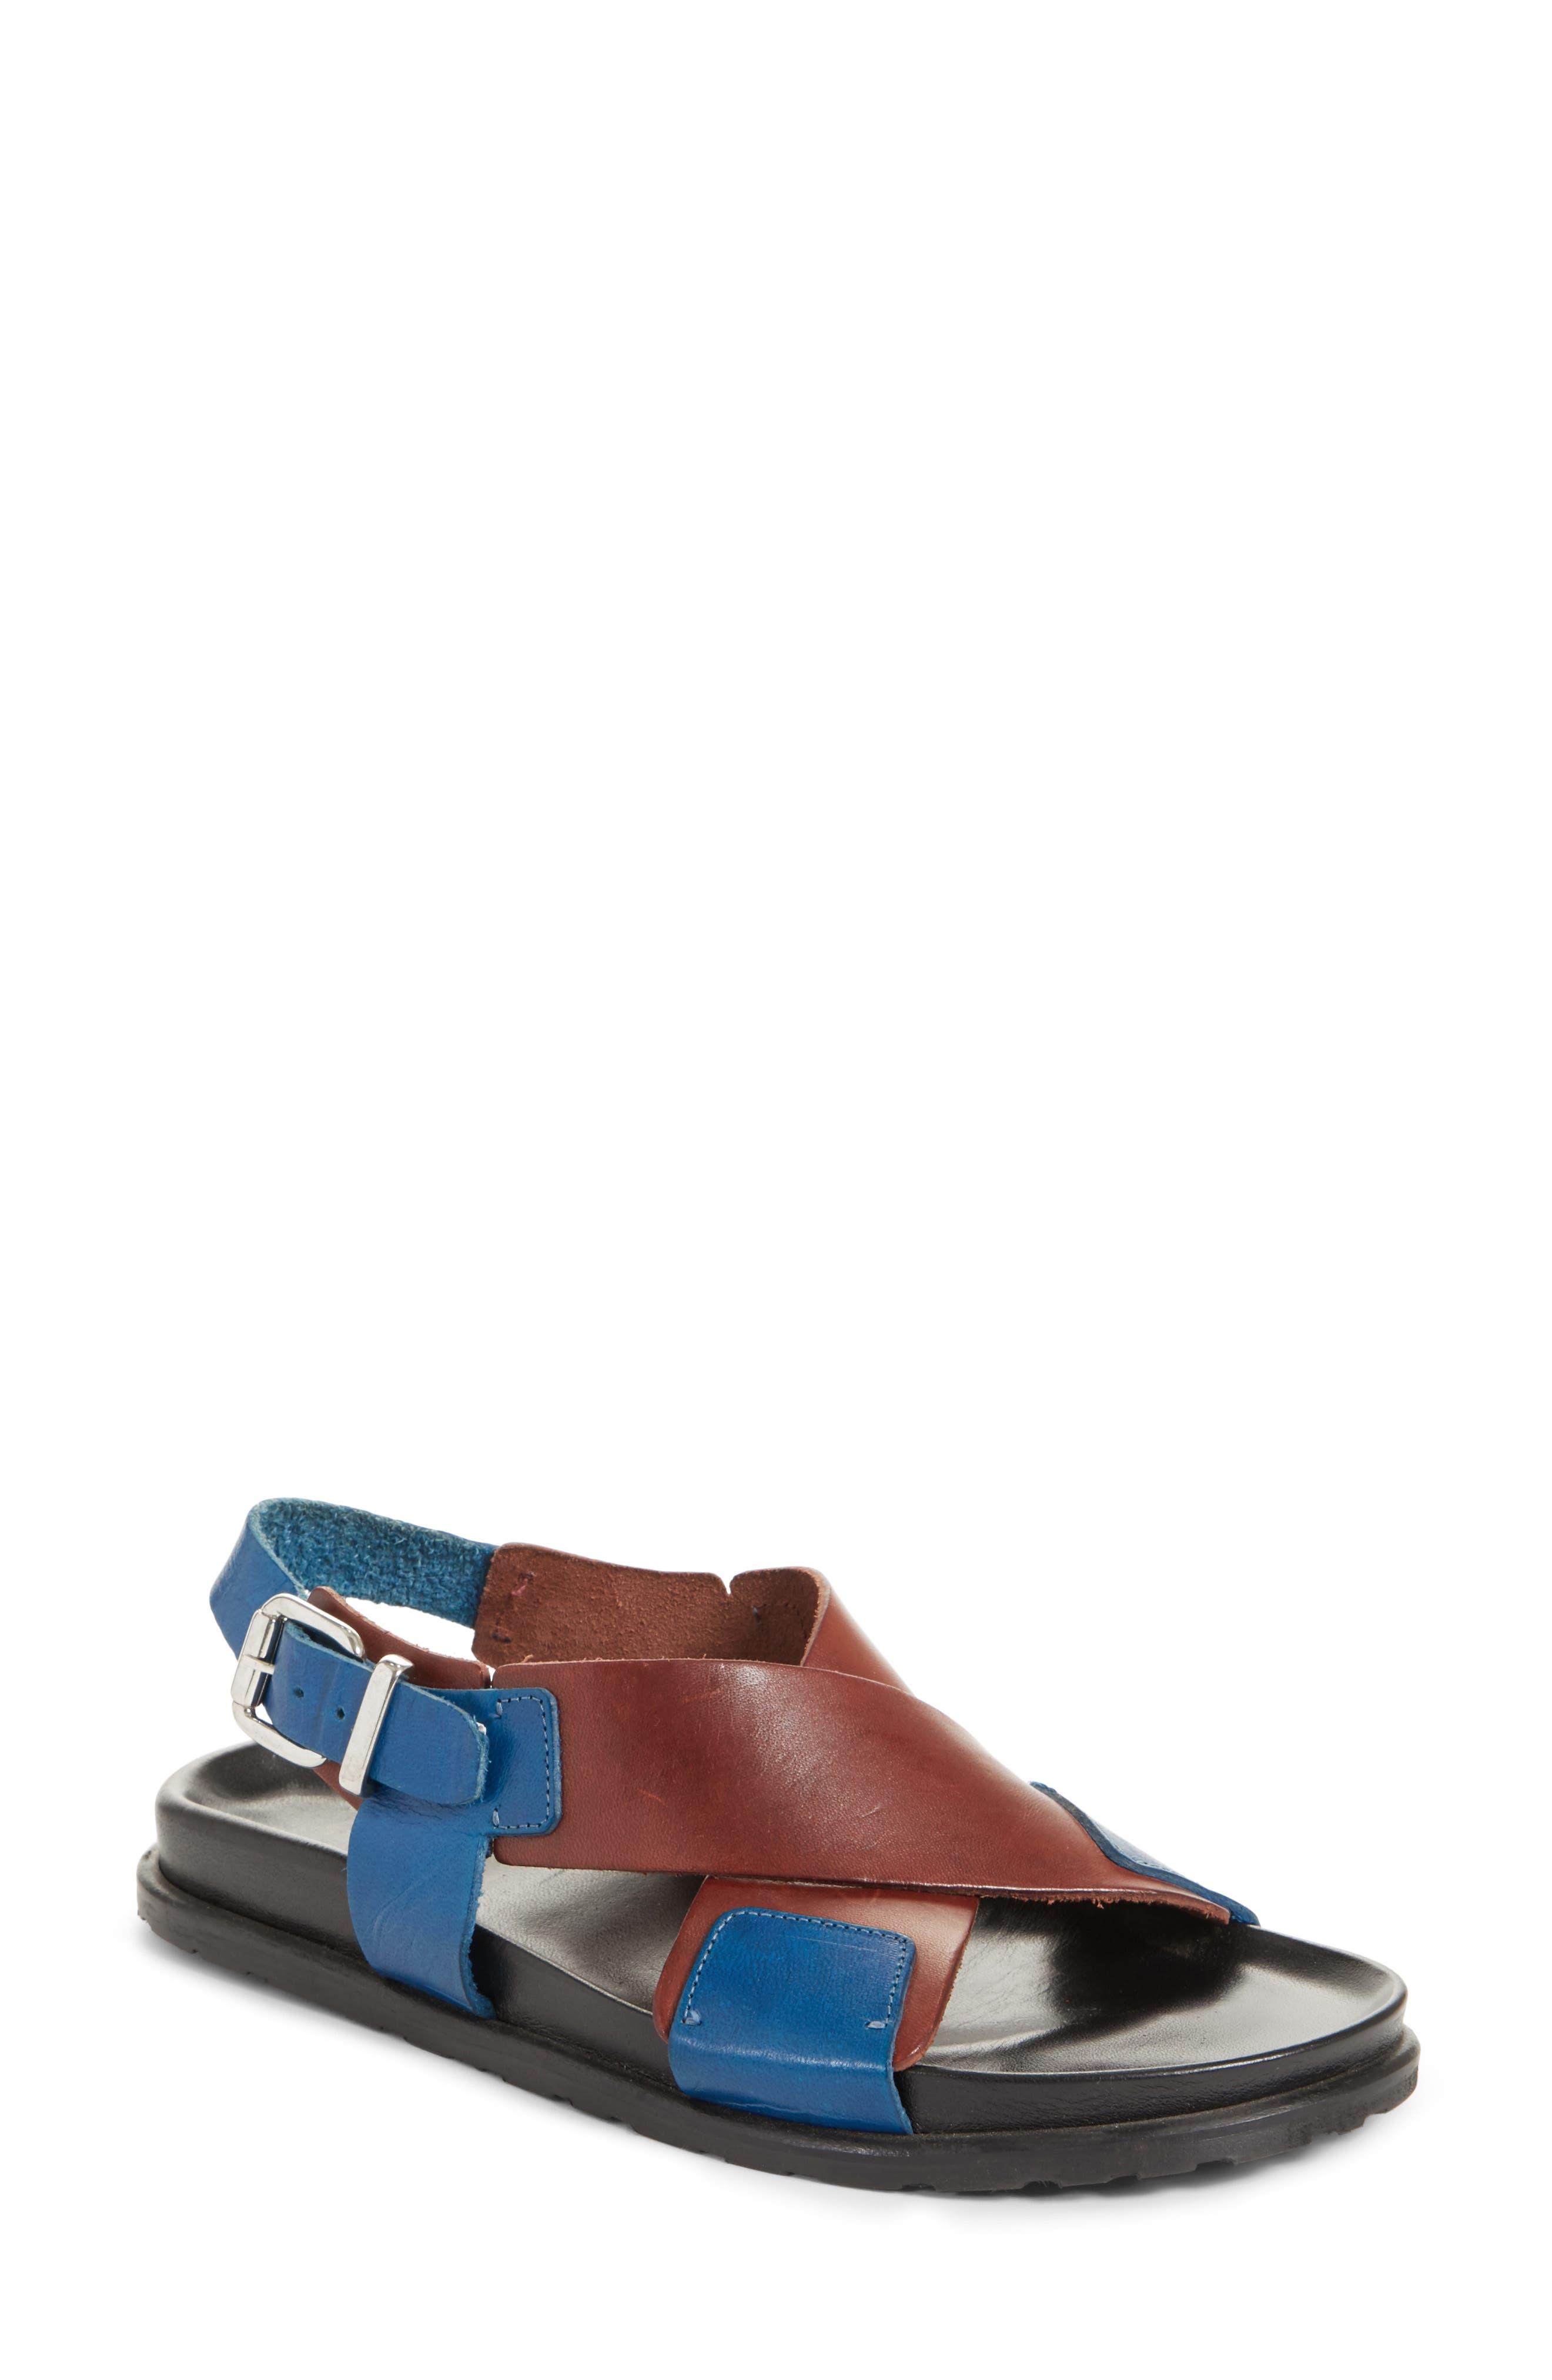 Bicolor Strappy Sandal,                             Main thumbnail 1, color,                             200